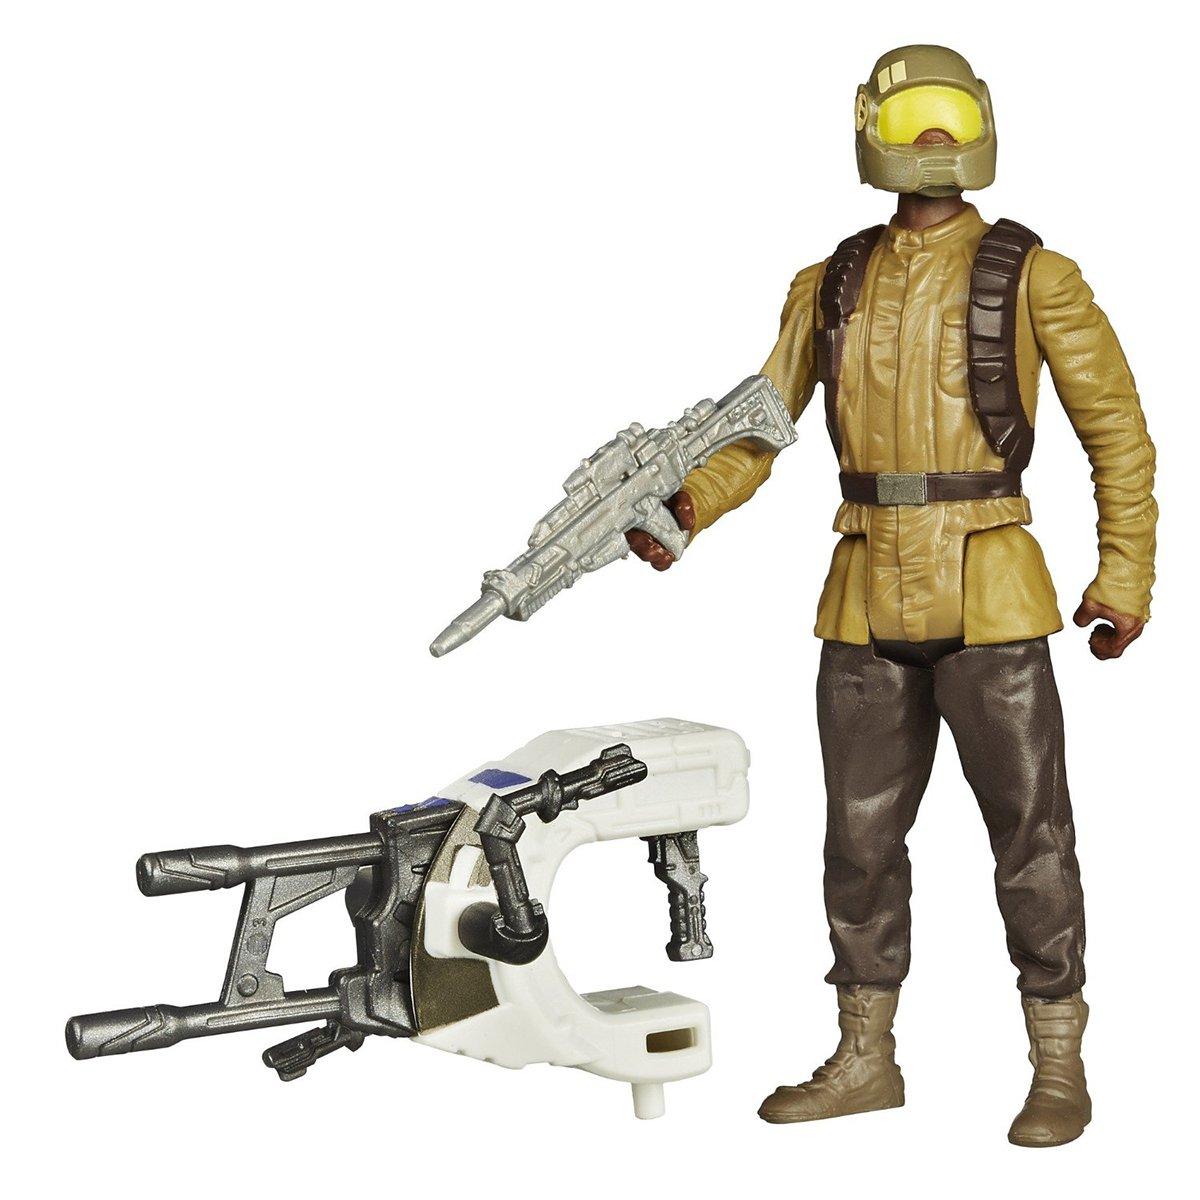 Set 2 figurine Star Wars The Force Awakens - Soldat al Rezistentei Space Mission, 9.5 cm imagine 2021